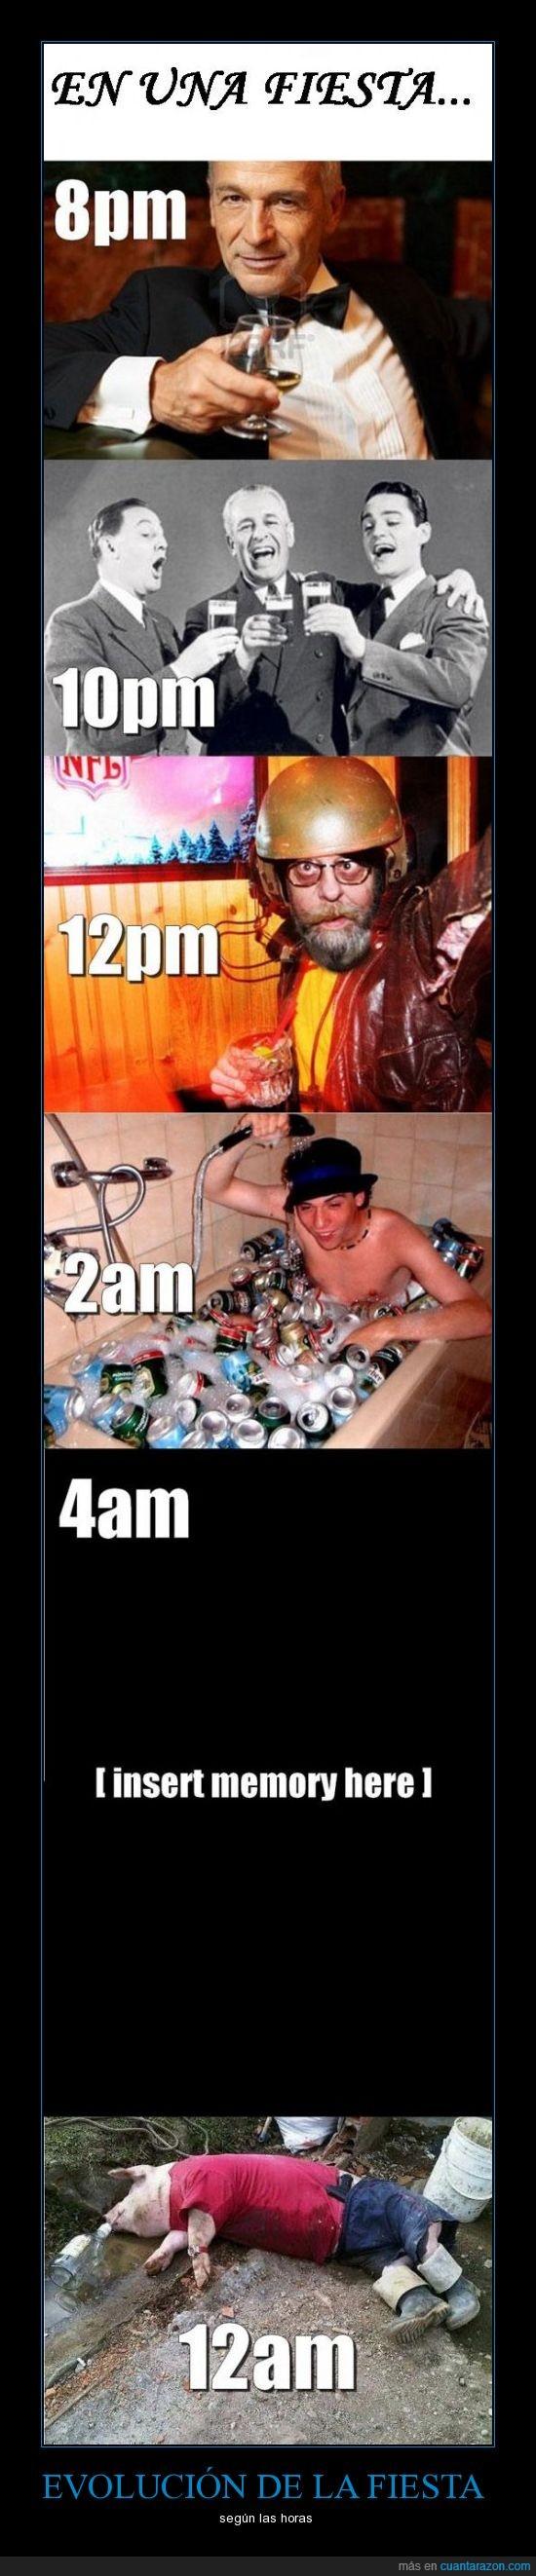 beber,borracho,cerdo,fiesta,horas